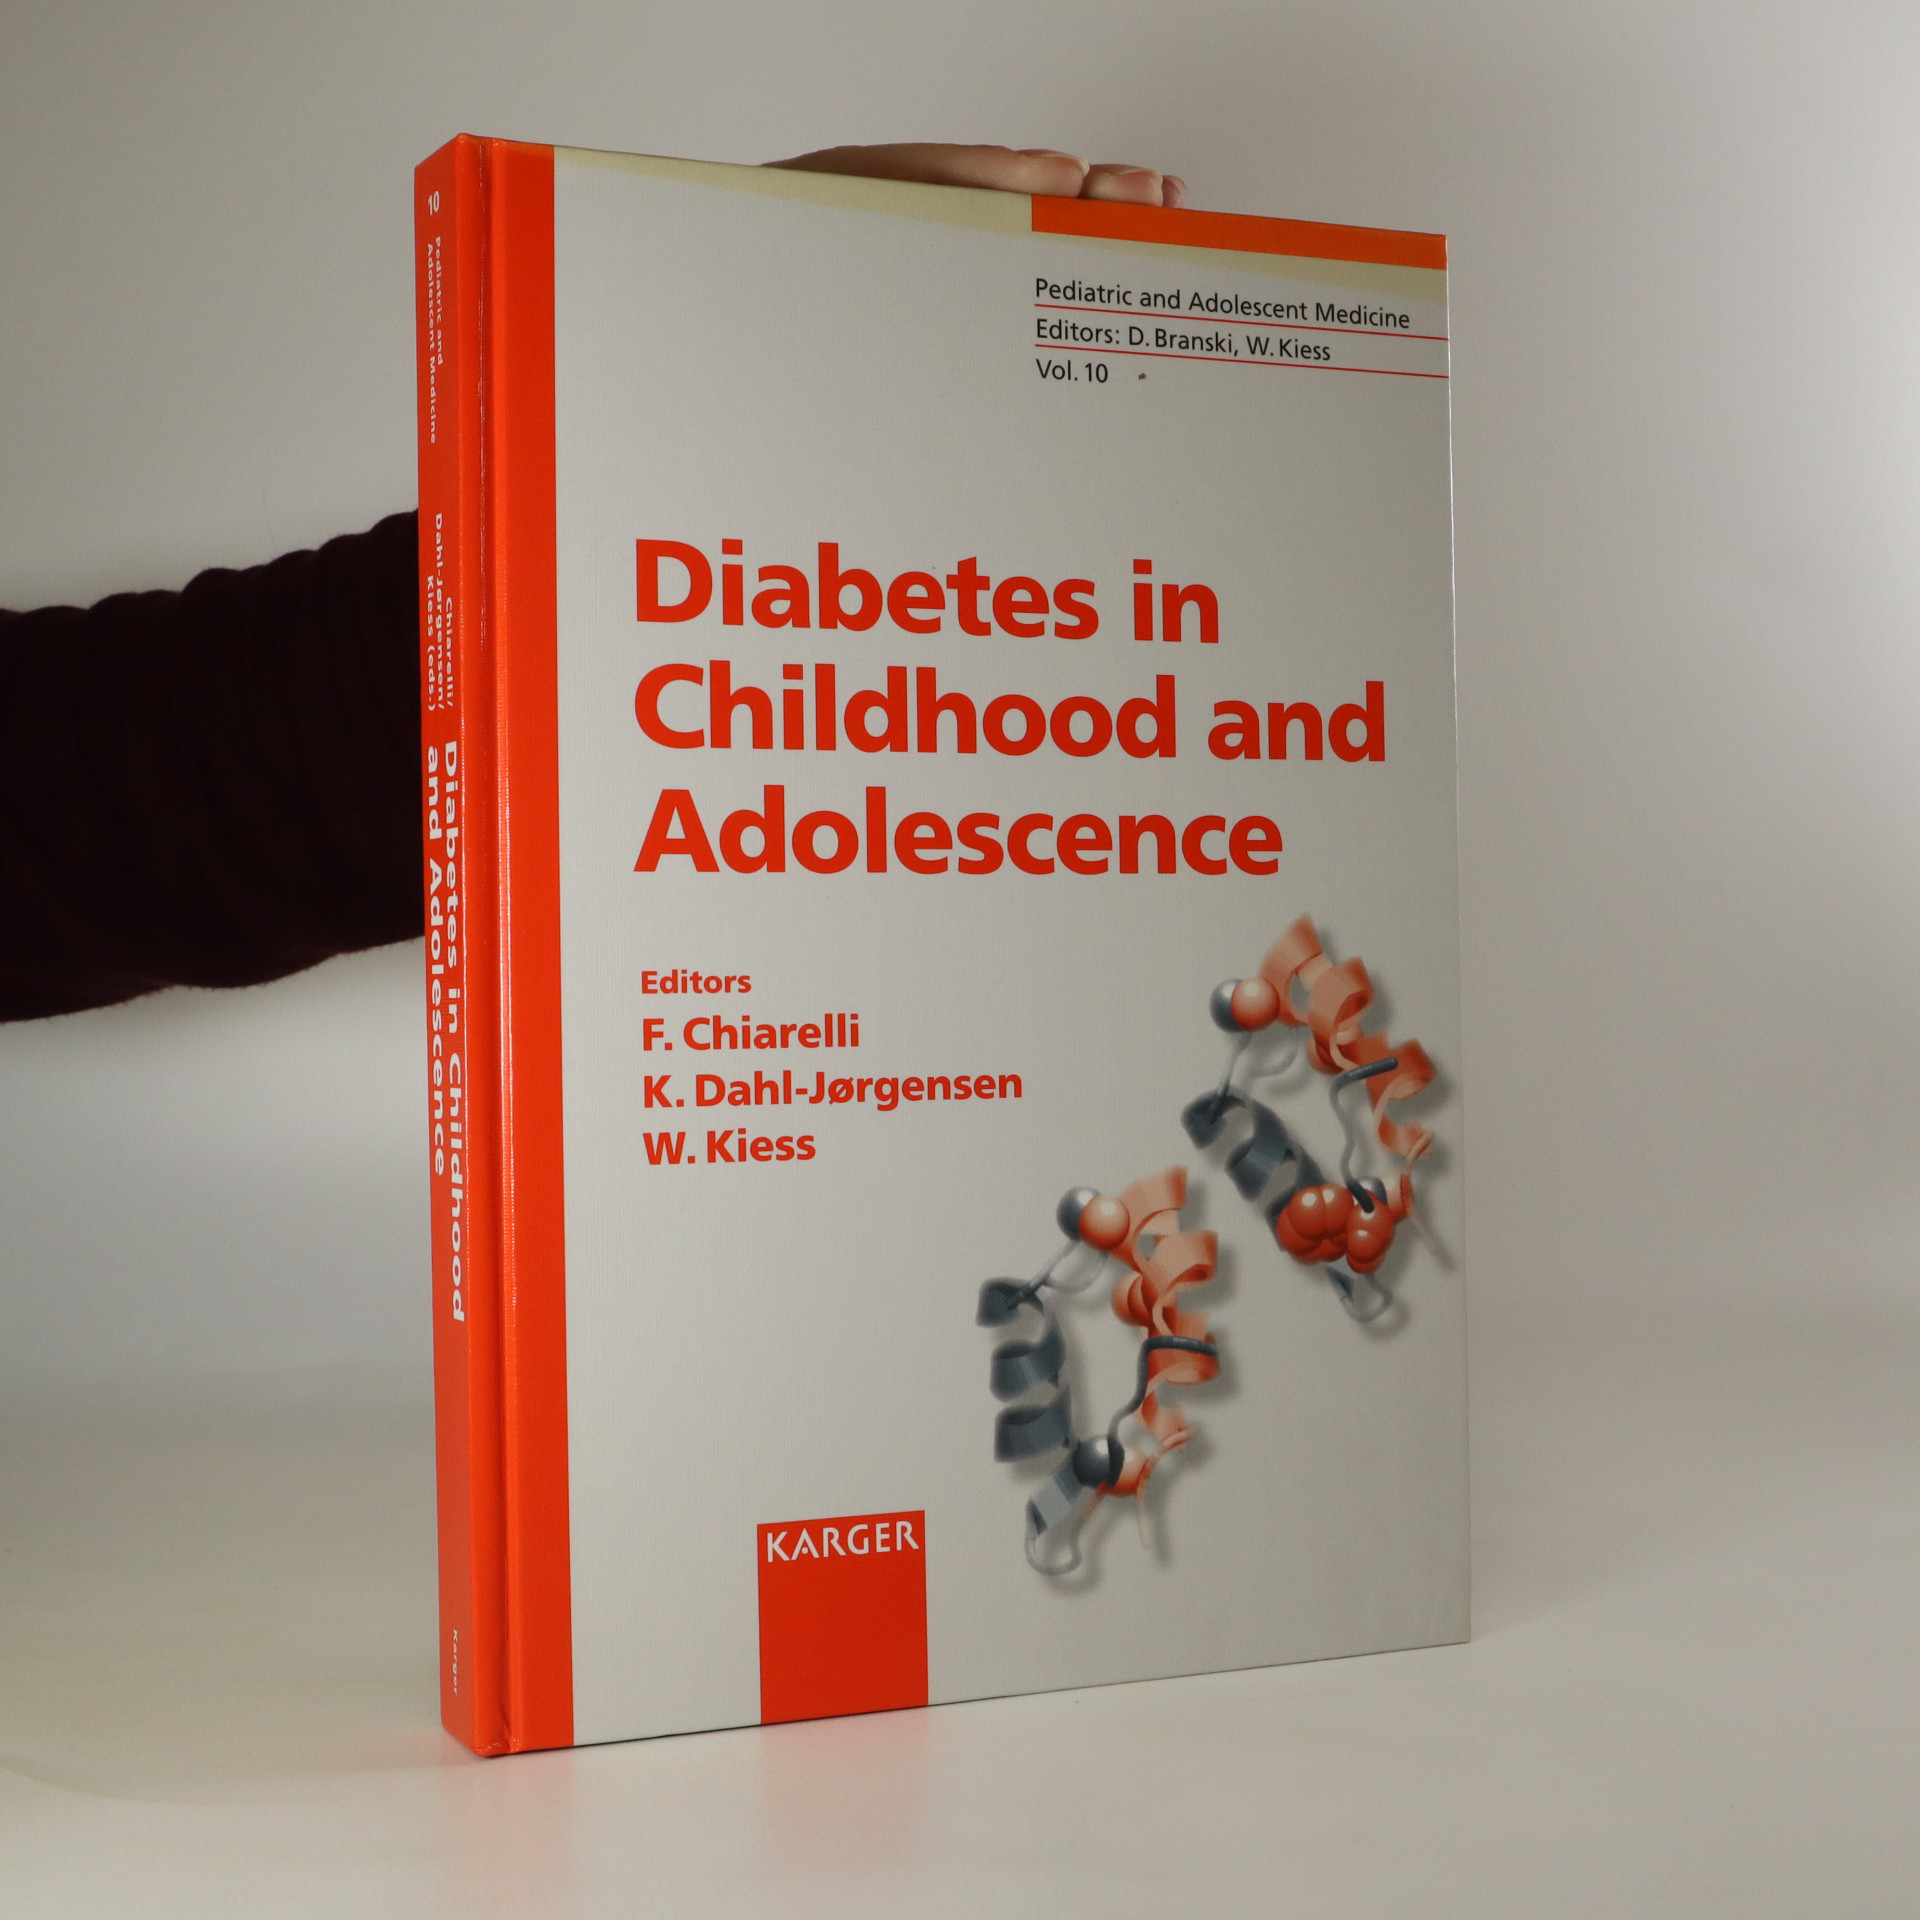 antikvární kniha Diabetes in Childhood and Adolescence, neuveden